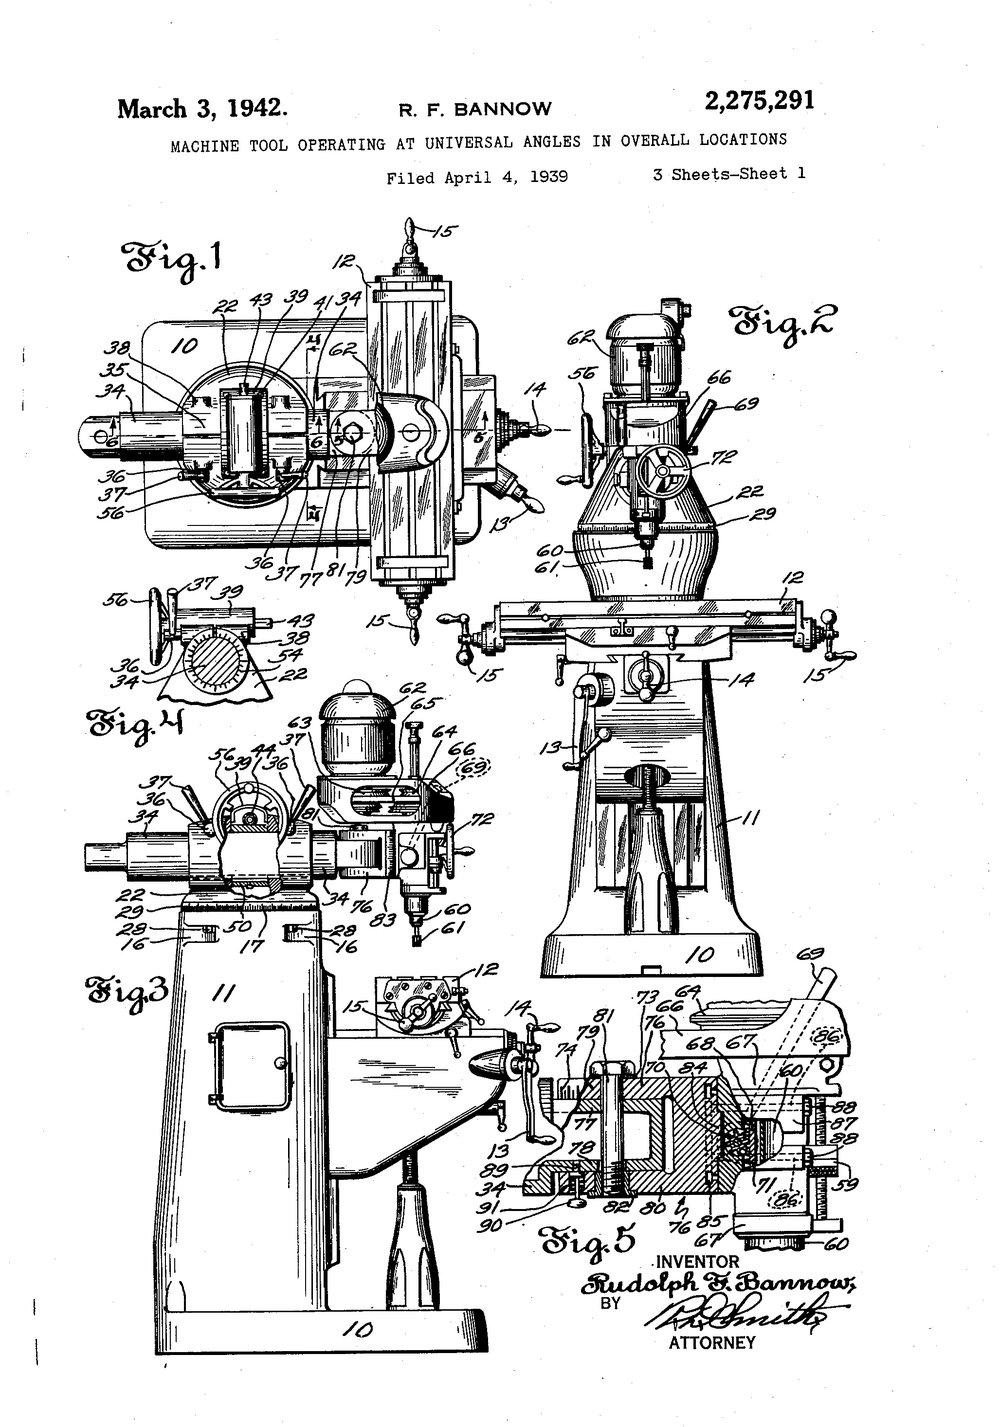 Upright (Bridgeport) Mill Patent Drawing